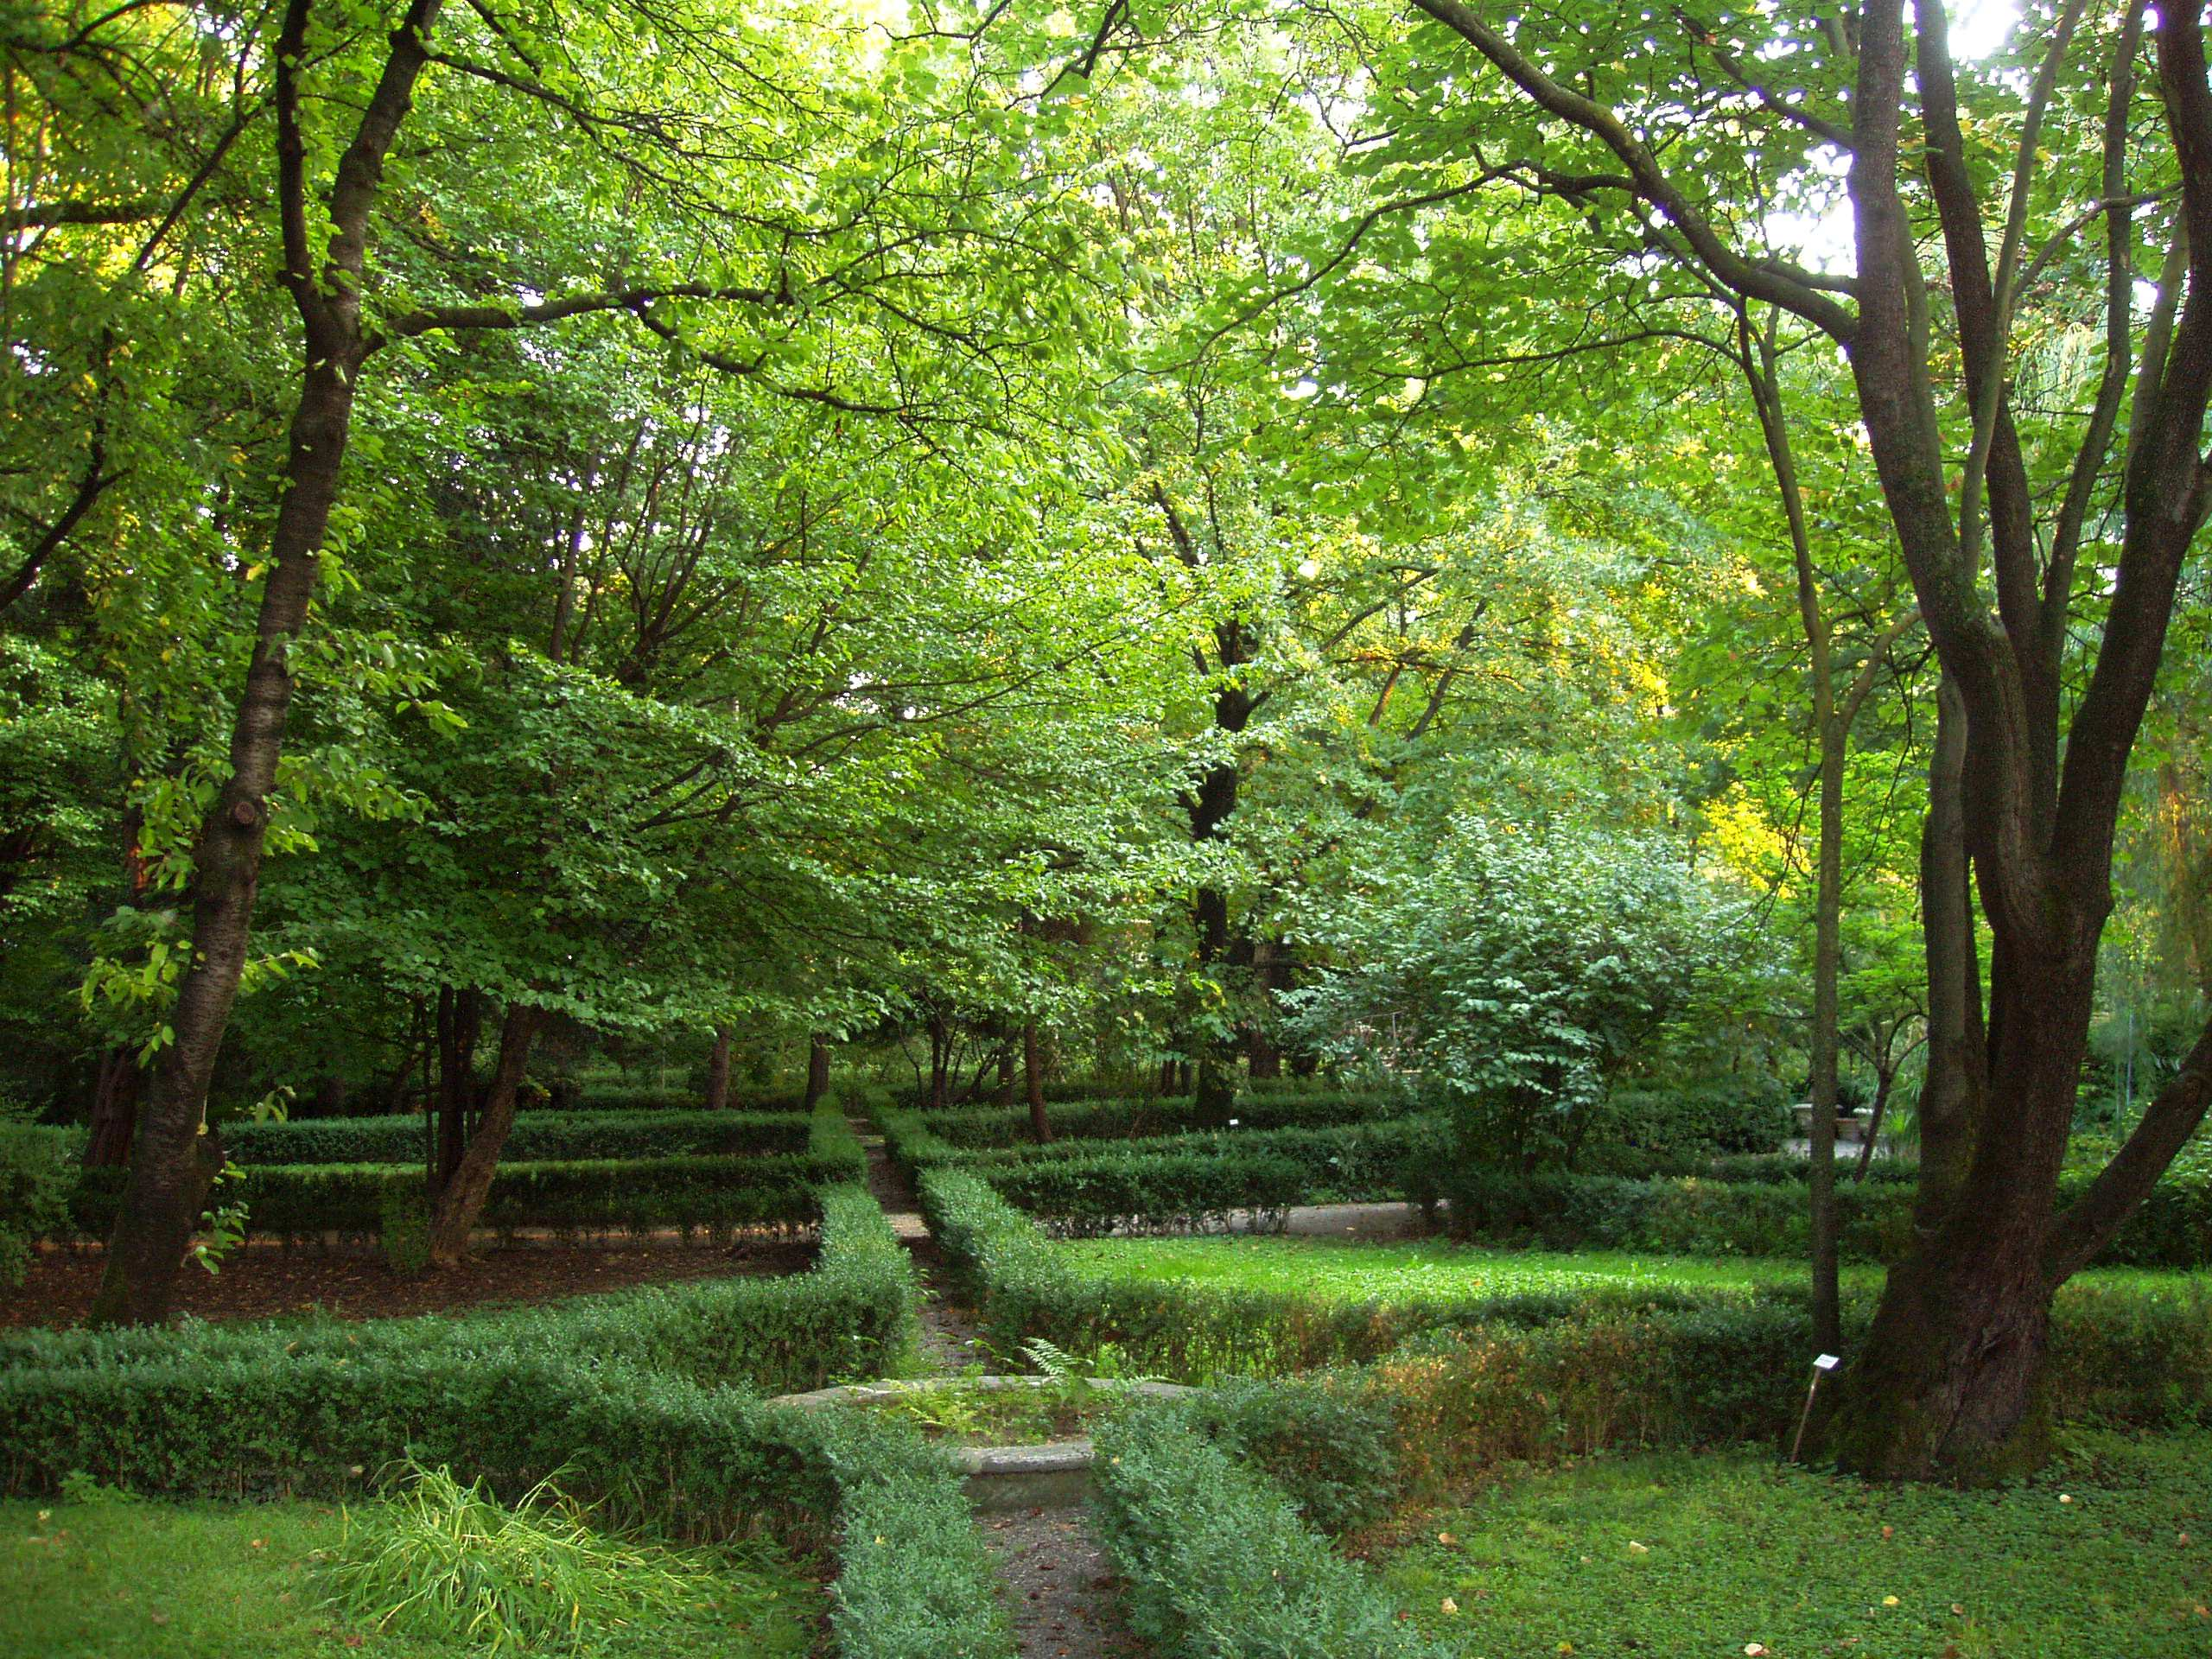 orto-botanico-di-parma-garden